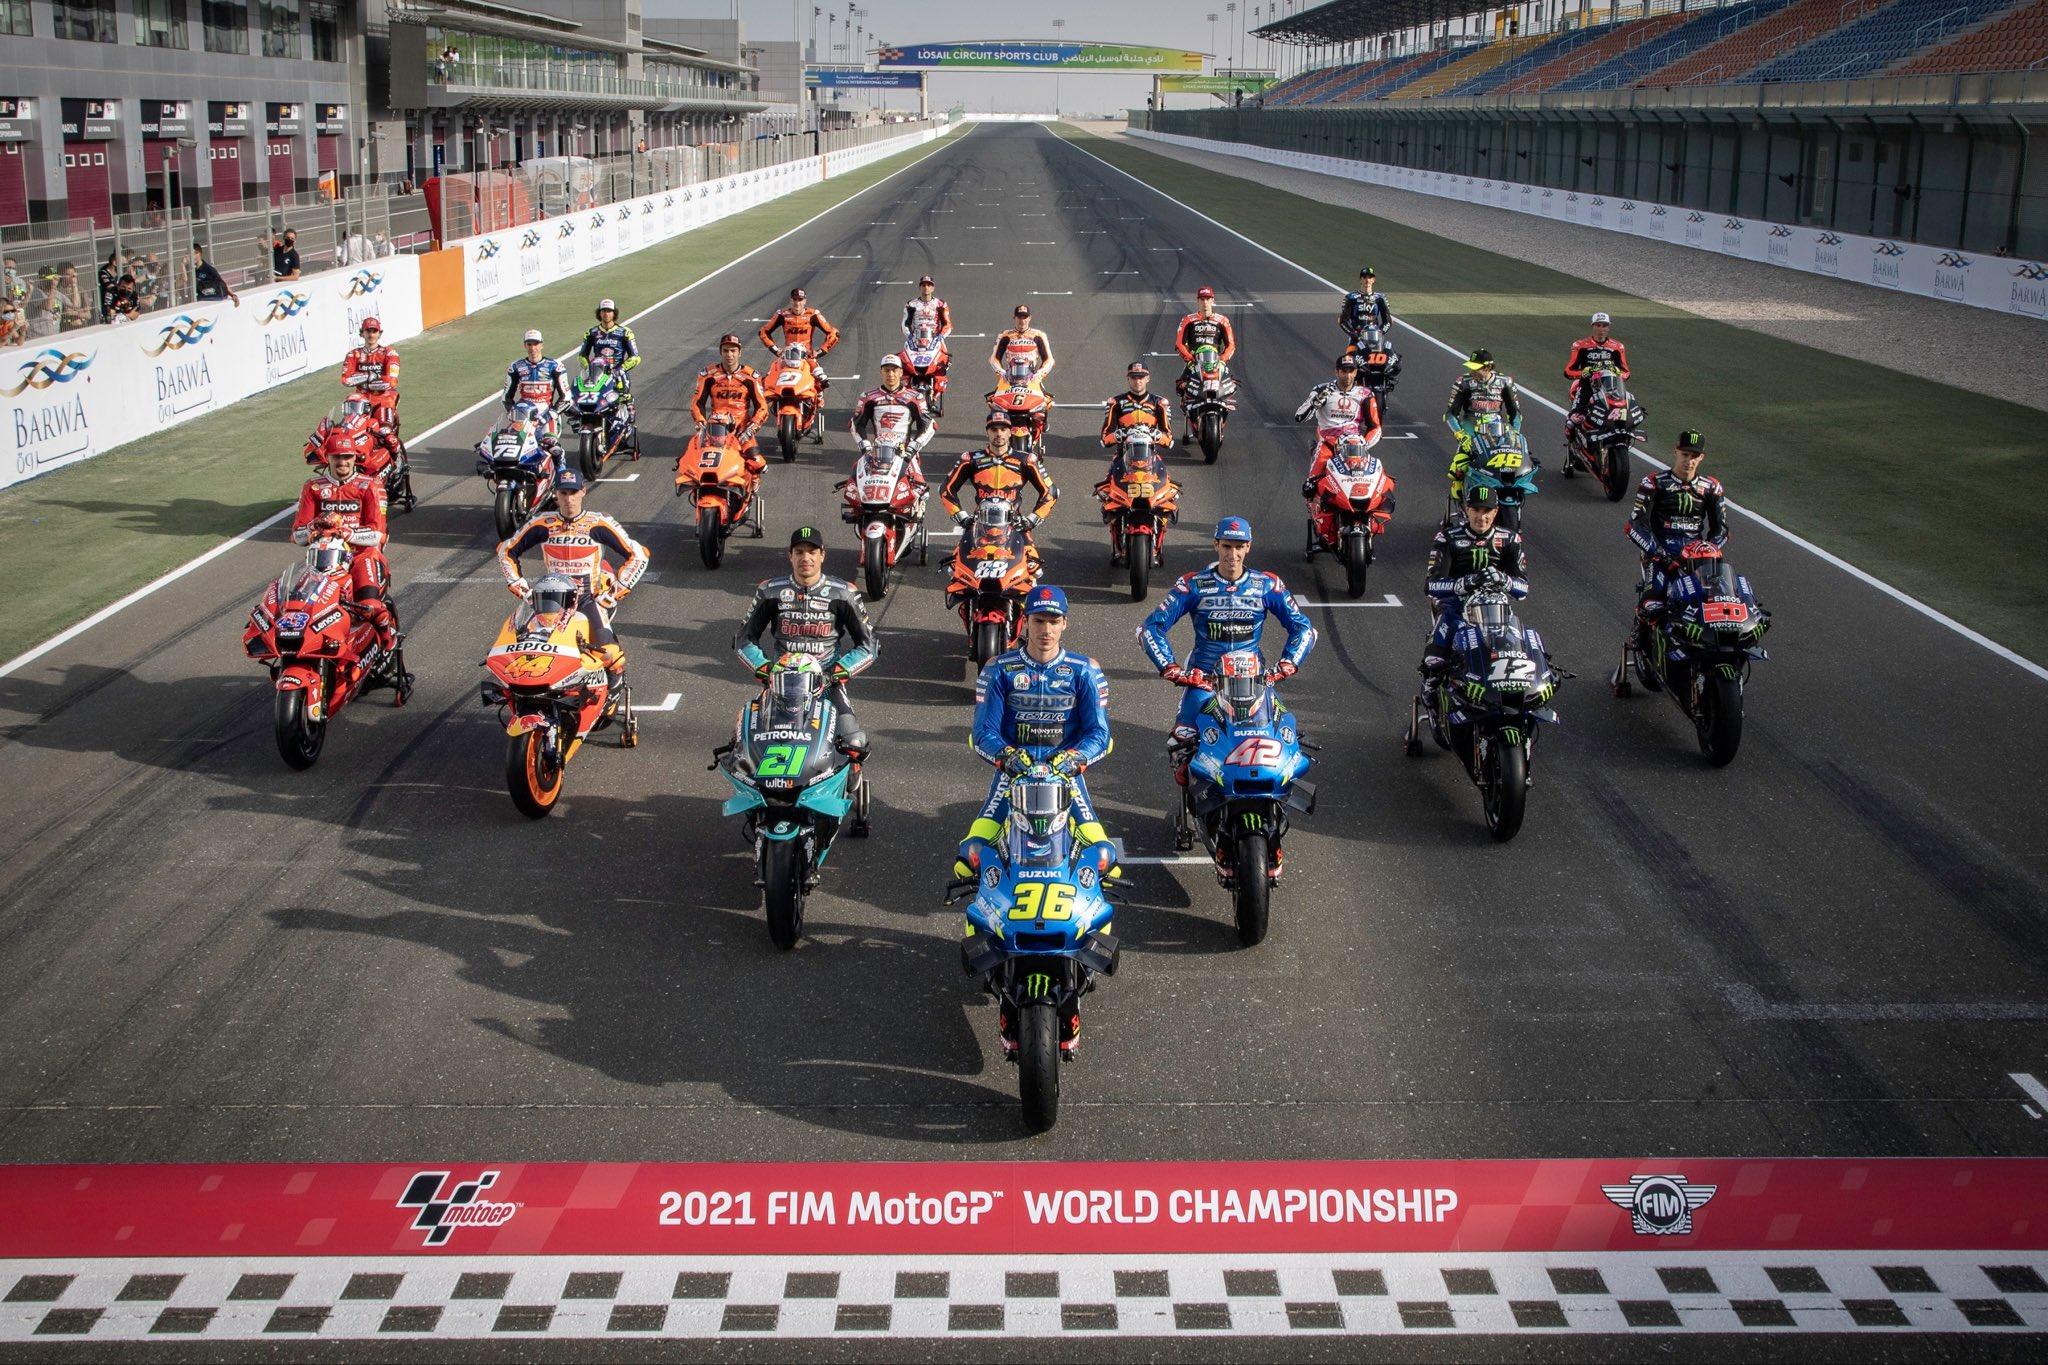 Moto GP 2021 - Page 4 ExVsDkEXIAIM-oT?format=jpg&name=large